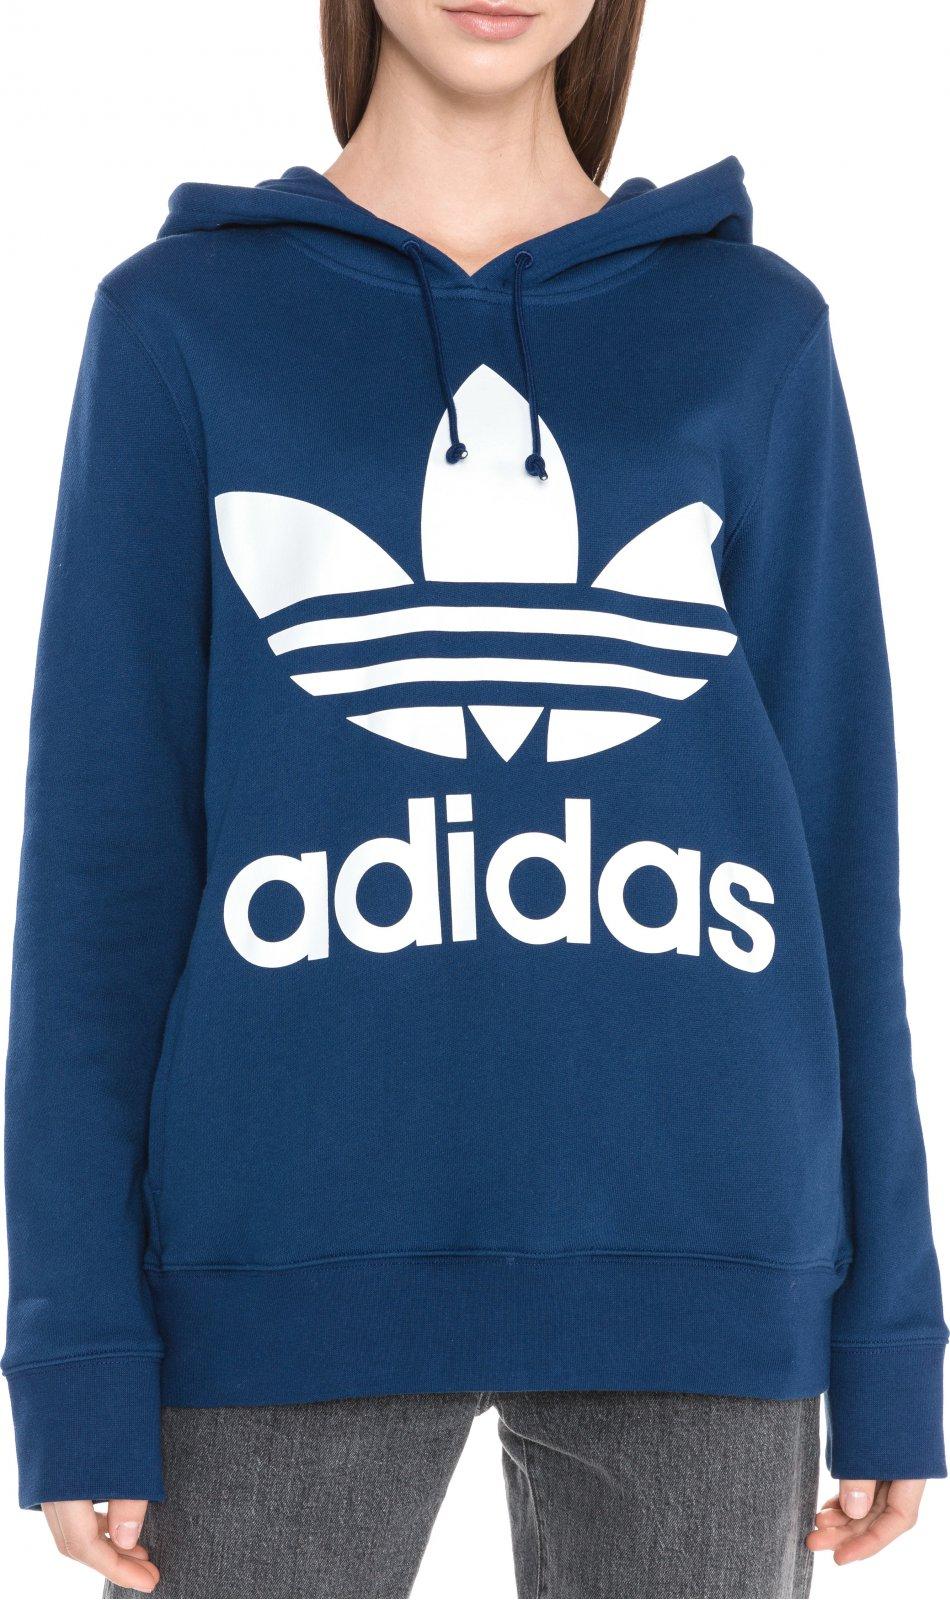 6cde67c1f0 Adidas Originals Trefoil Hoodie mikina dámská tmavě modrá od 1 259 ...